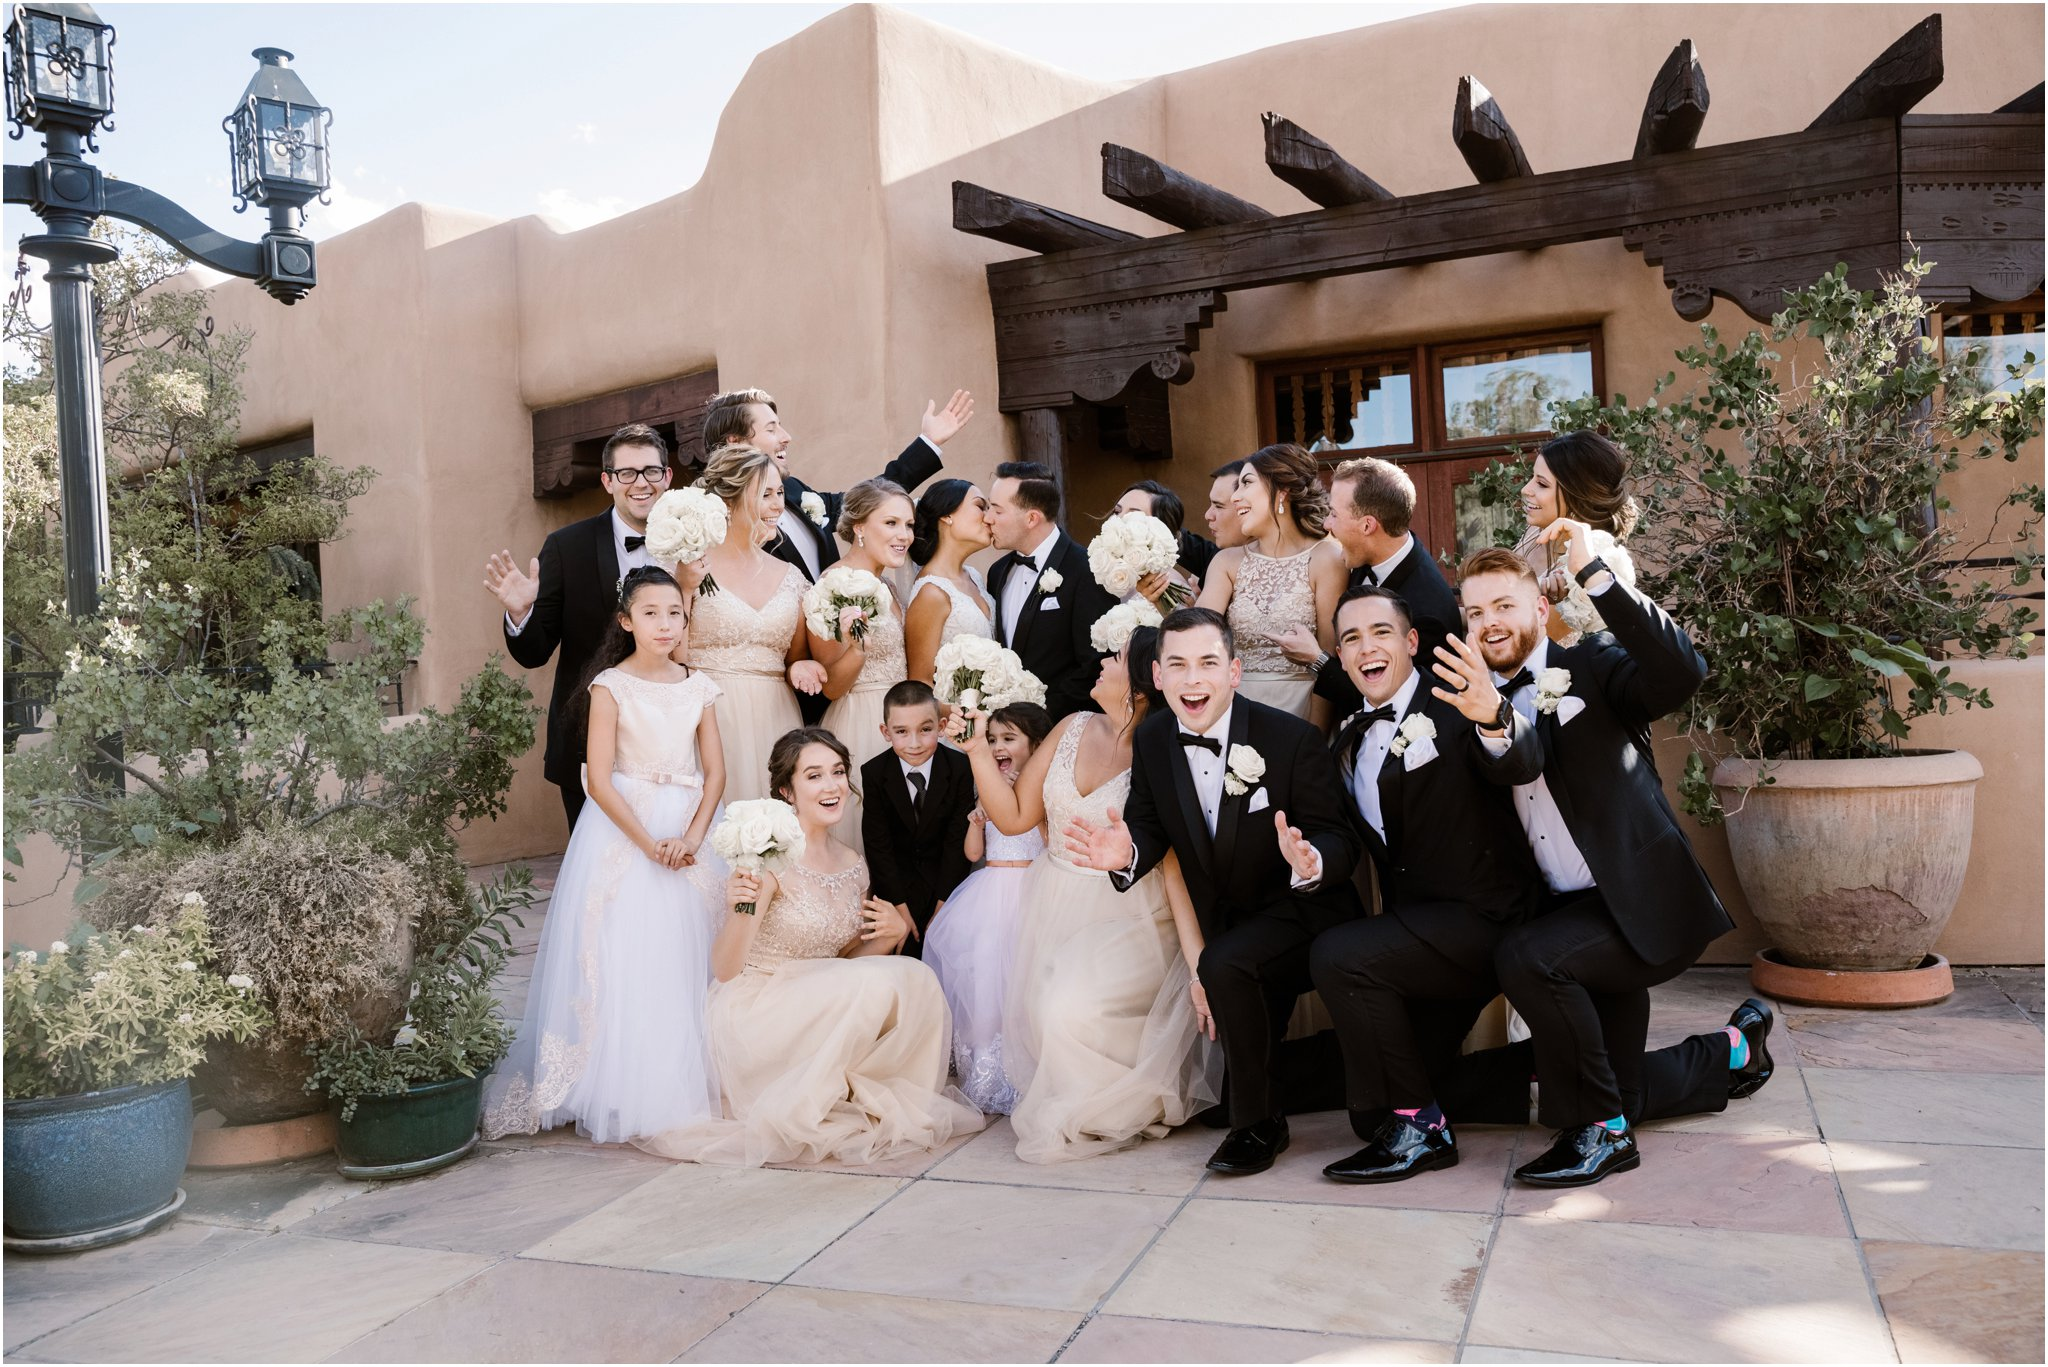 Santa Fe Wedding Photographers, Blue Rose Photography at La Fonda on the Plaza Hotel